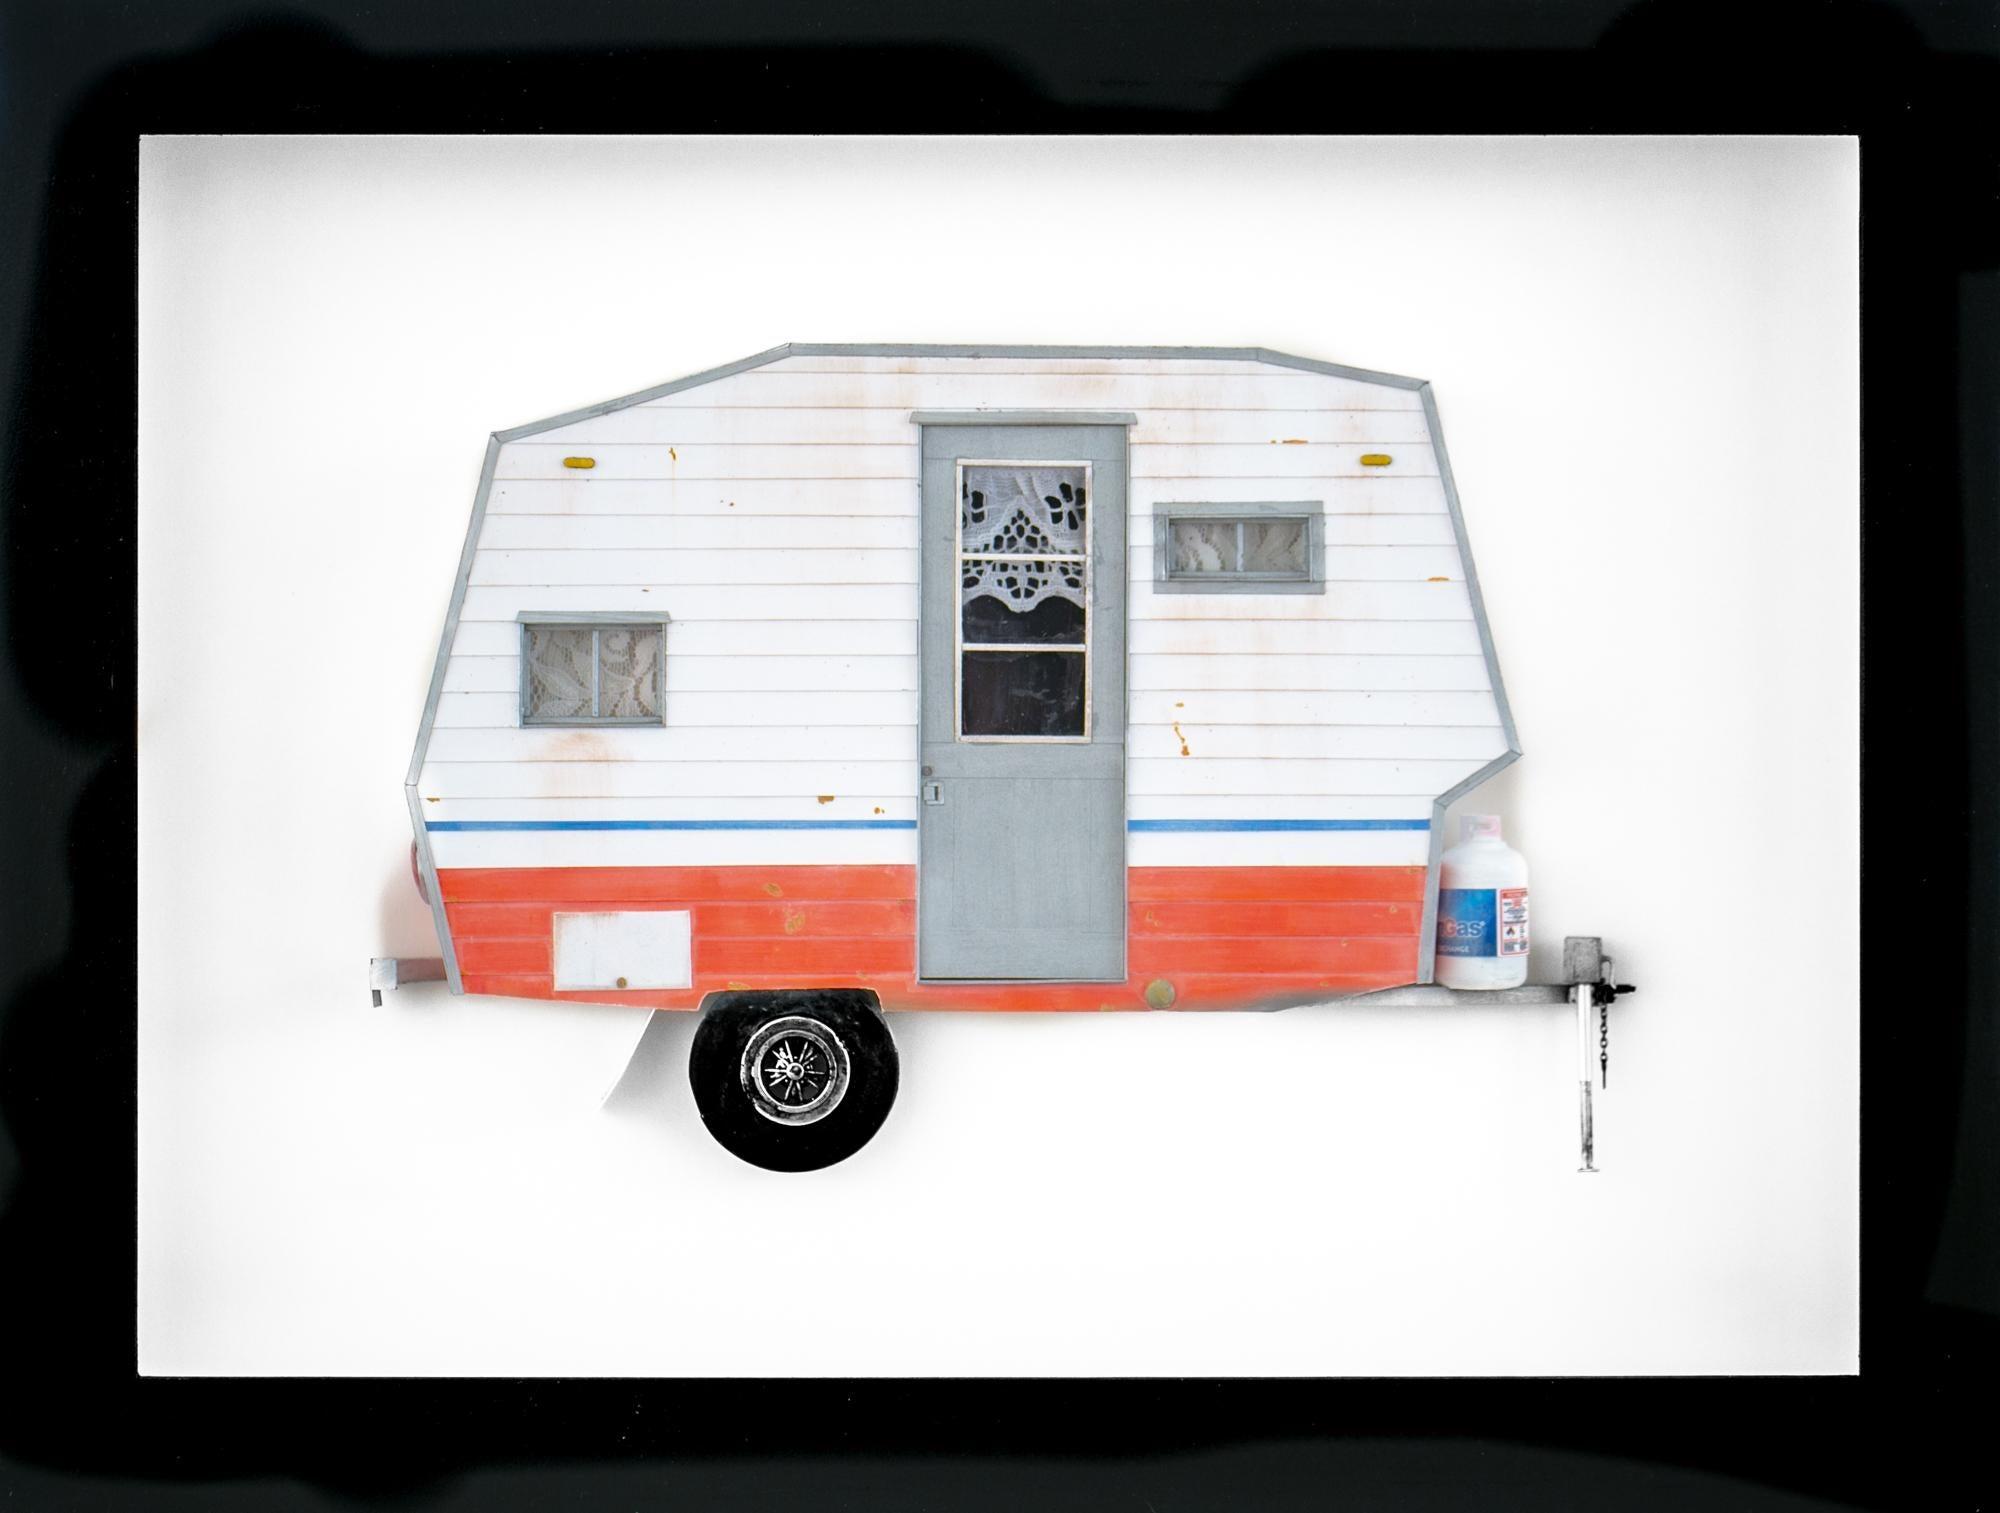 """OVER IT"", Miniature, camping trailer van, paper sculpture"